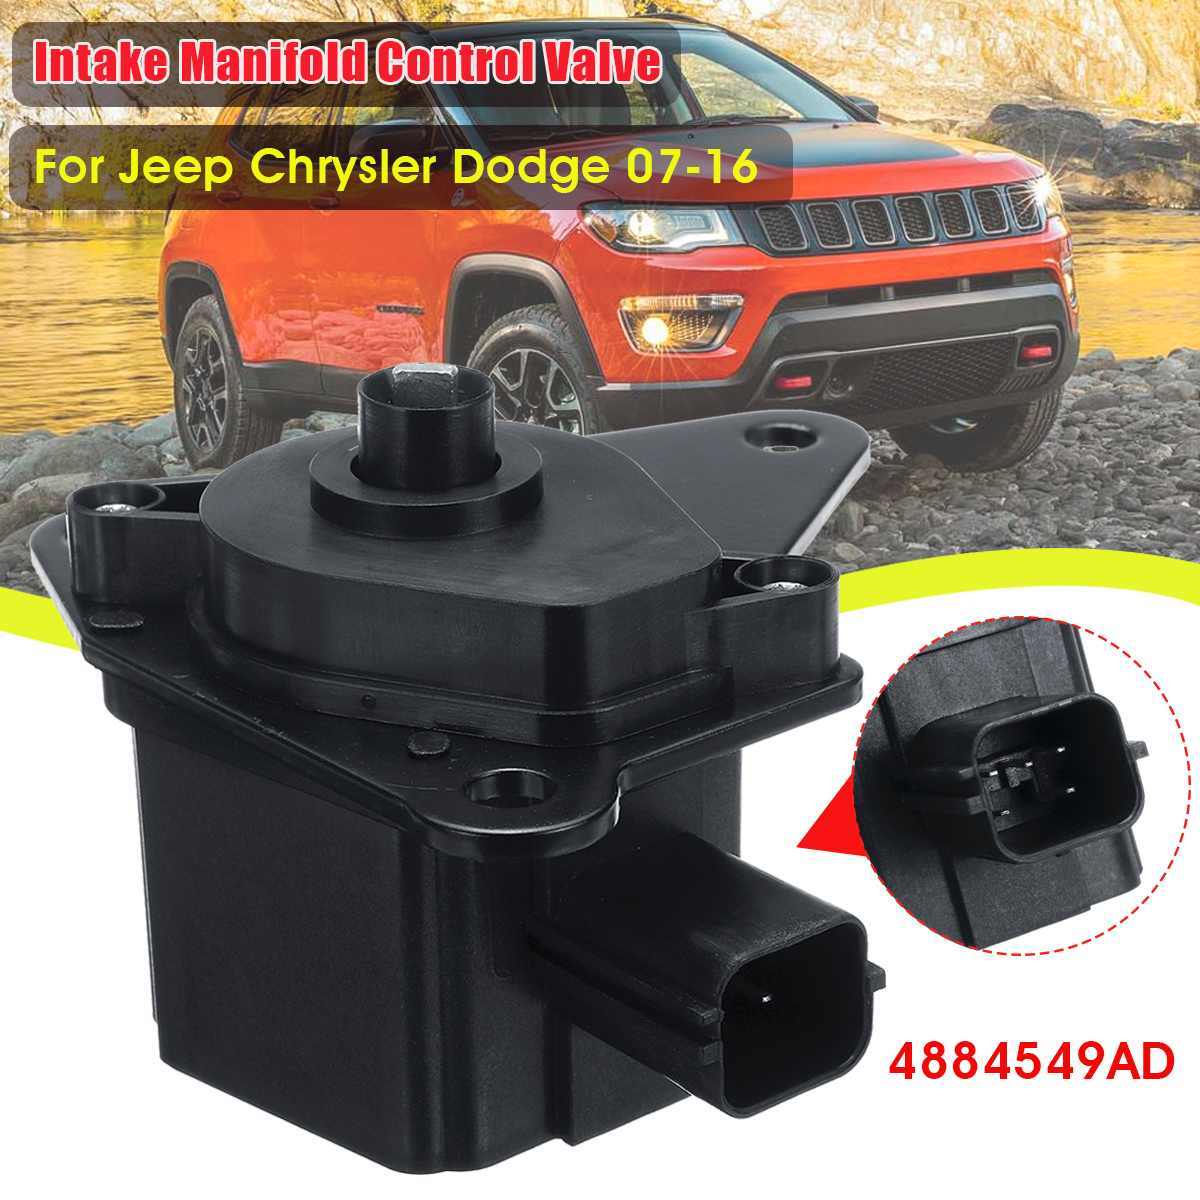 top 10 car control valve ideas and get free shipping - fj7da1fee